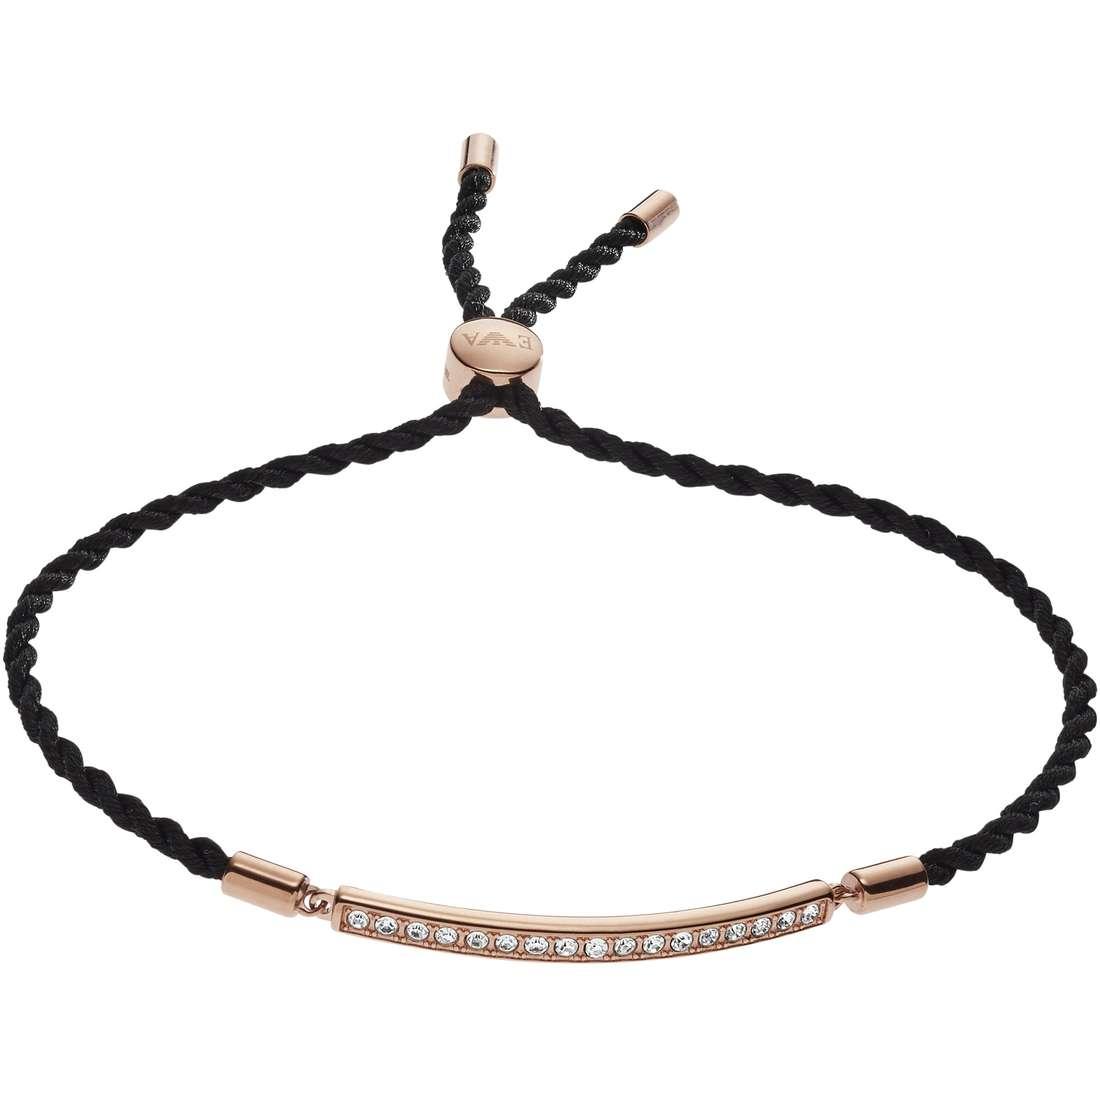 bracelet woman jewellery Emporio Armani Architectural Elegance EGS2190221